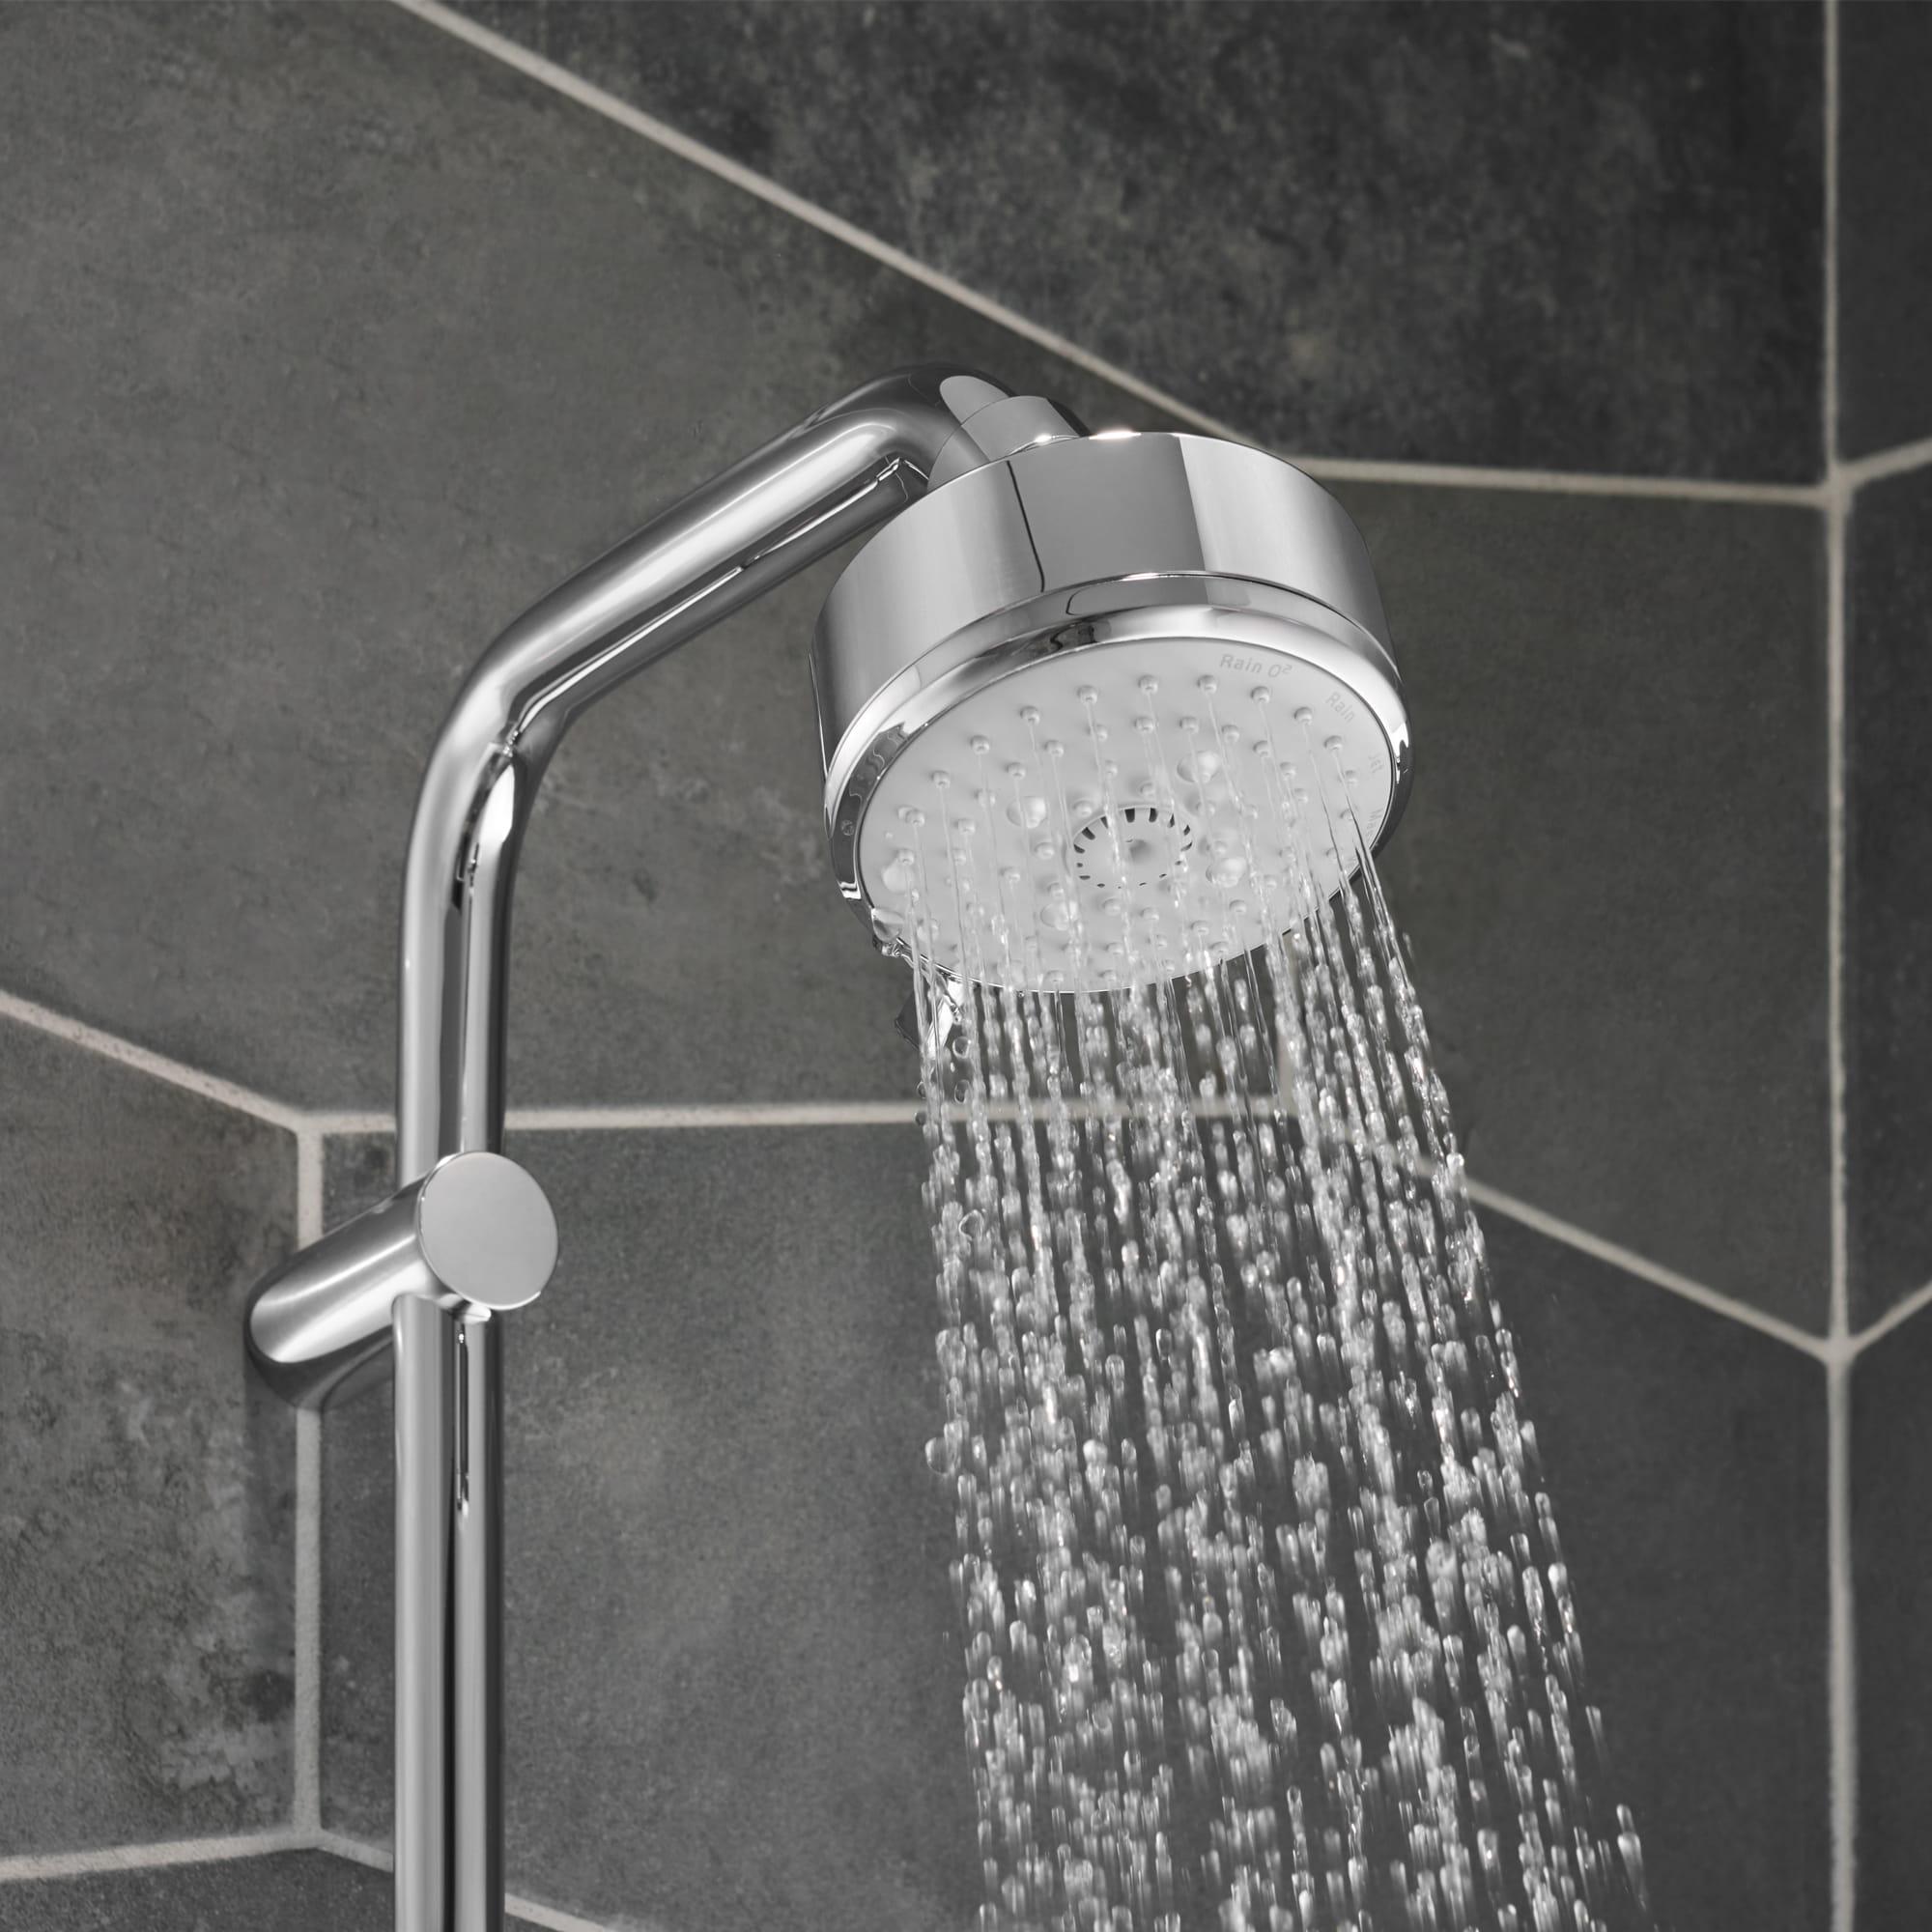 shower-  show original title black-mat Details about  /Shower grohe tempesta II 100 shower showerhead